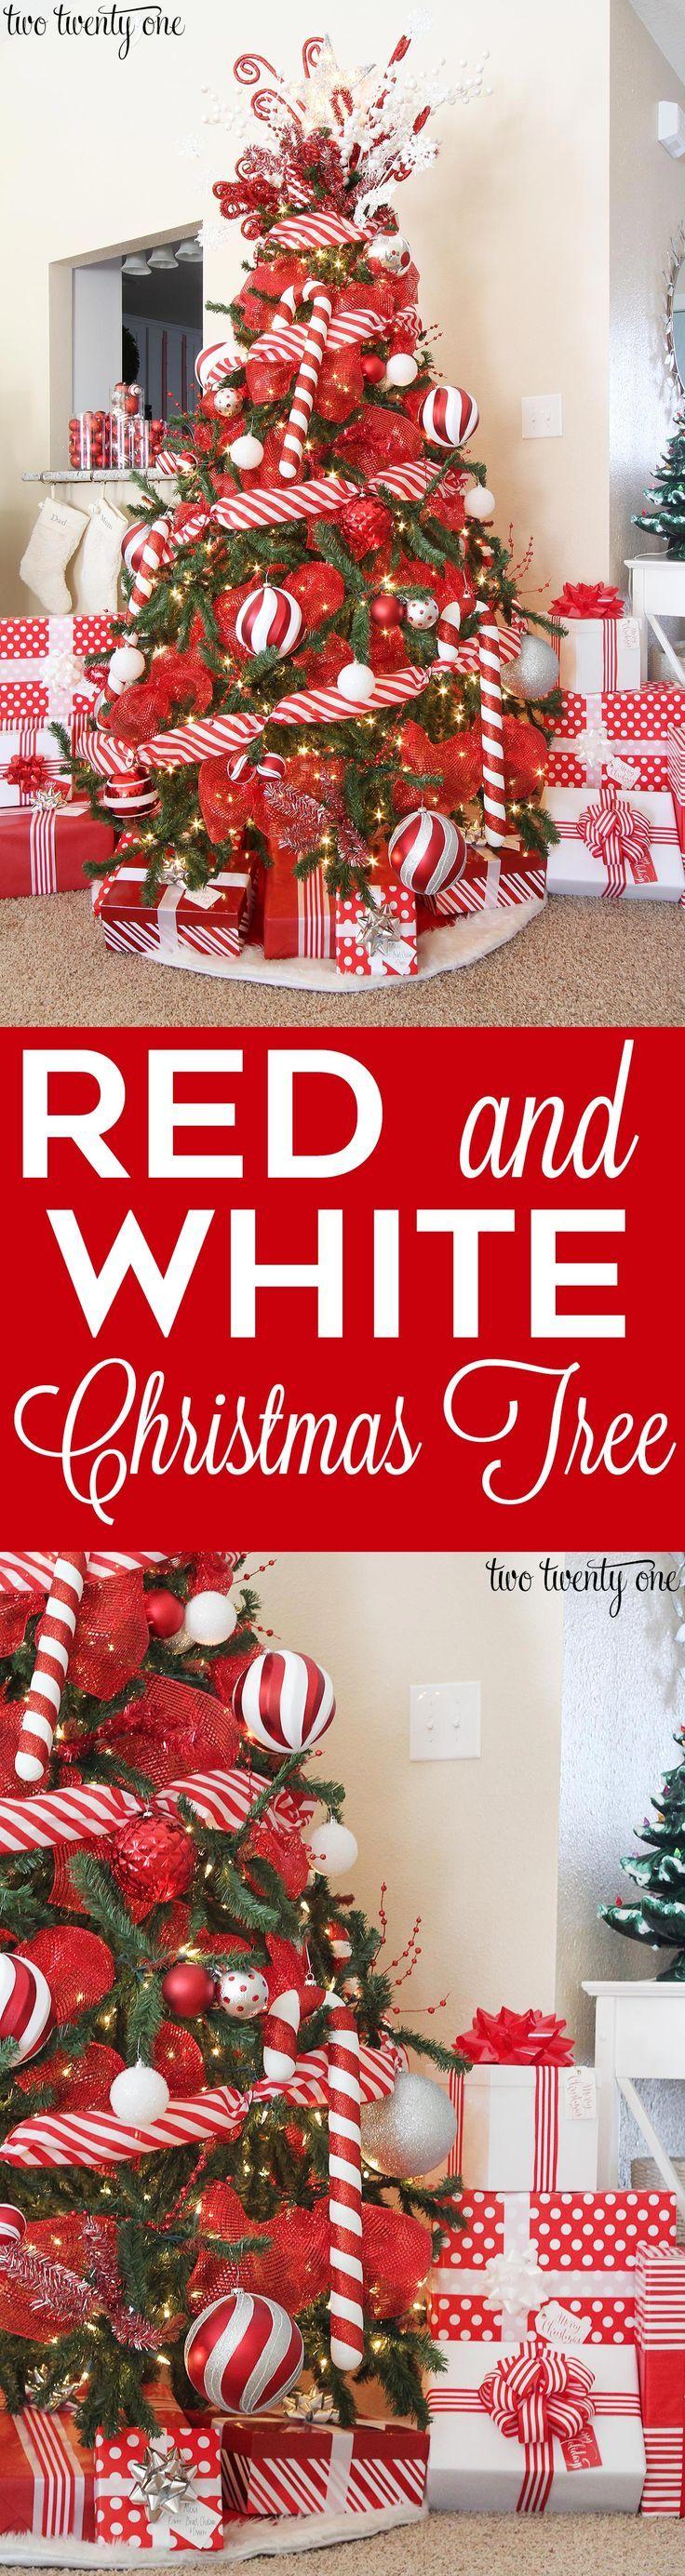 552 best Christmas Creativity images on Pinterest